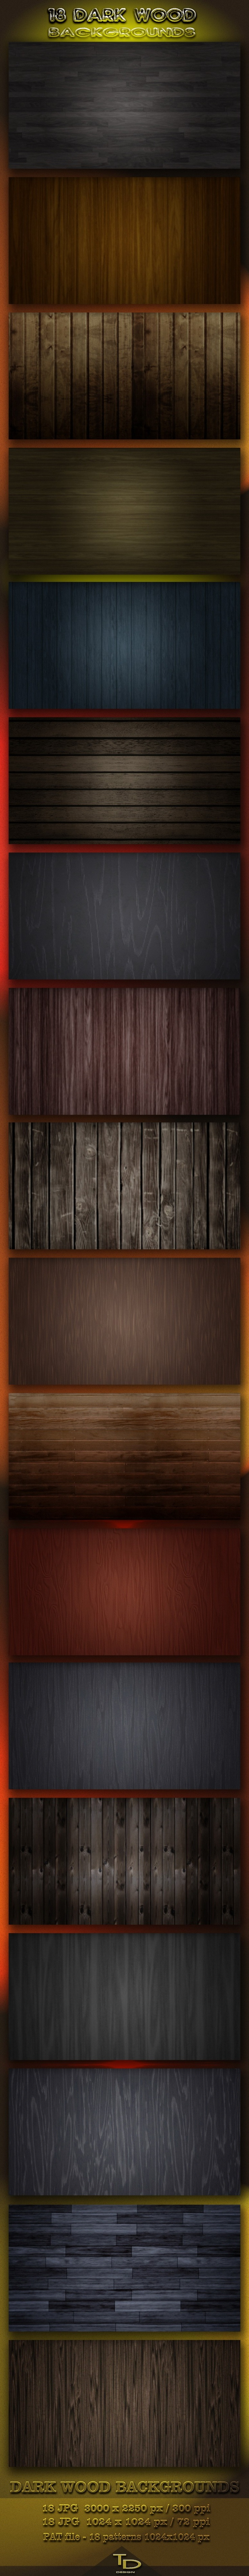 18 Dark Wood Backgrounds